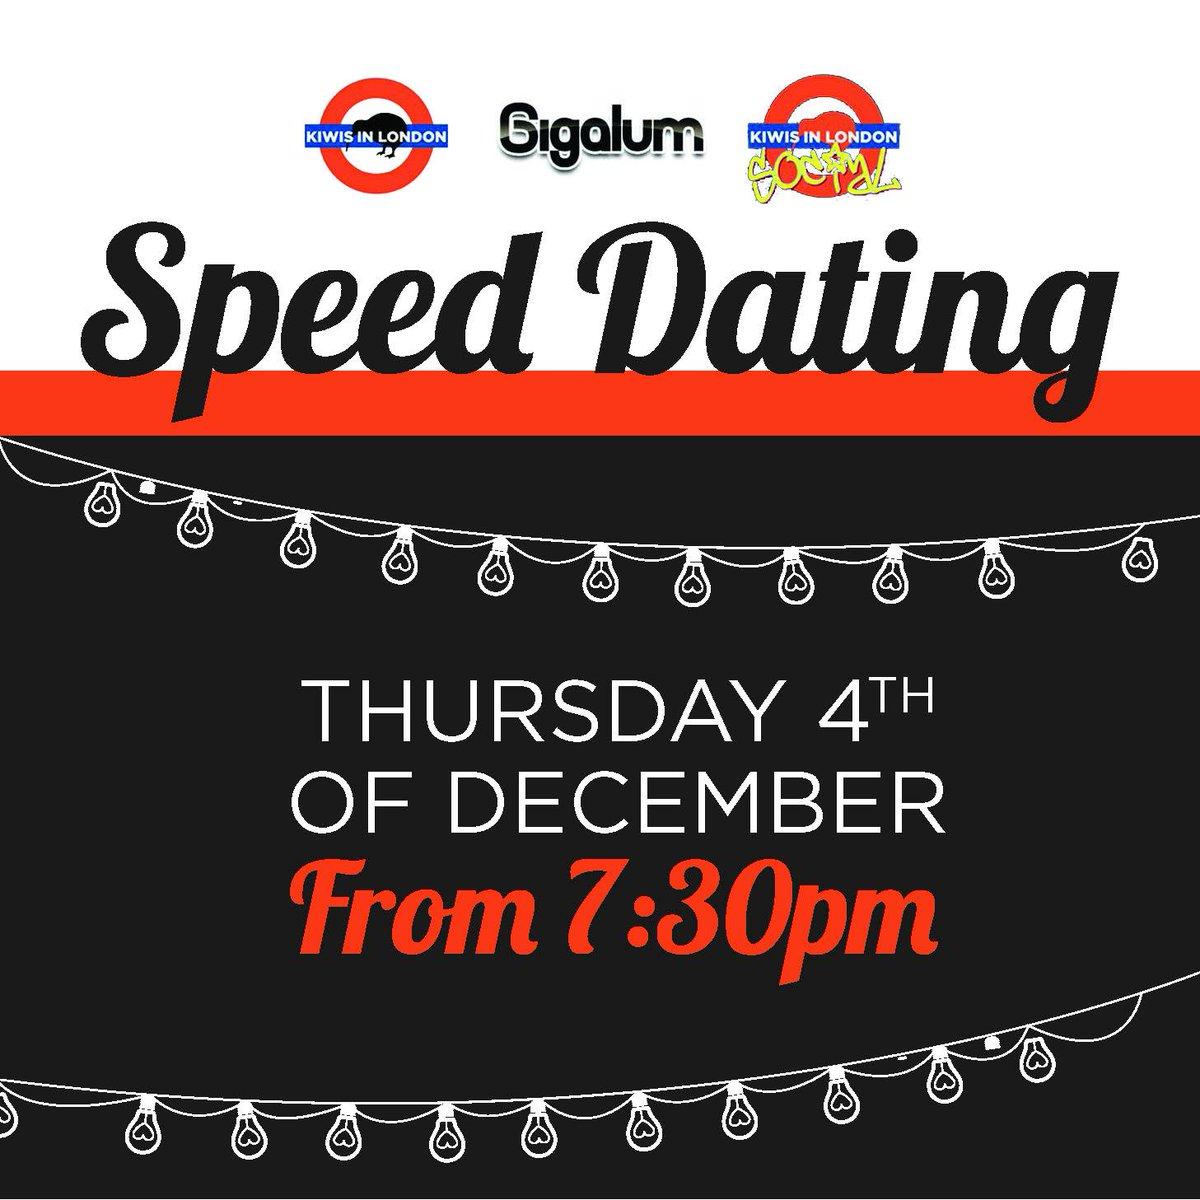 Gigalum Clapham speed dating